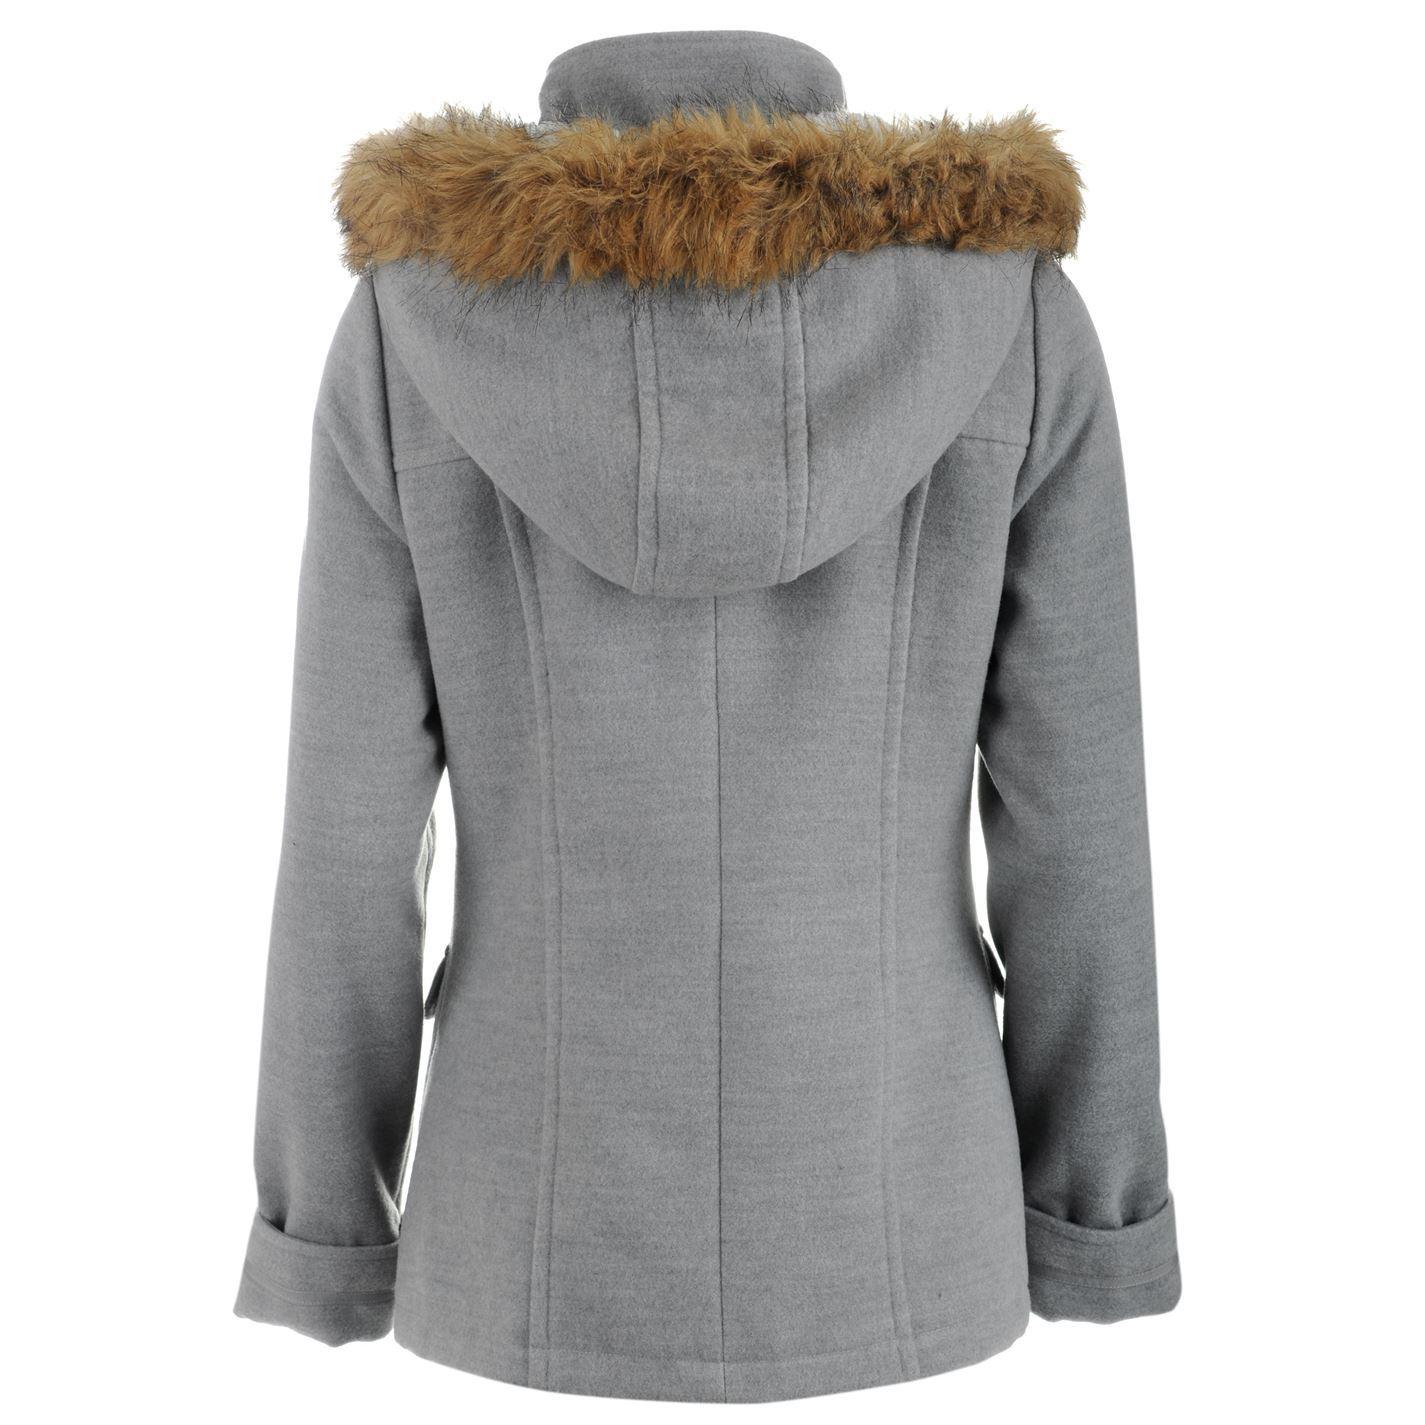 Womens duffle coats uk